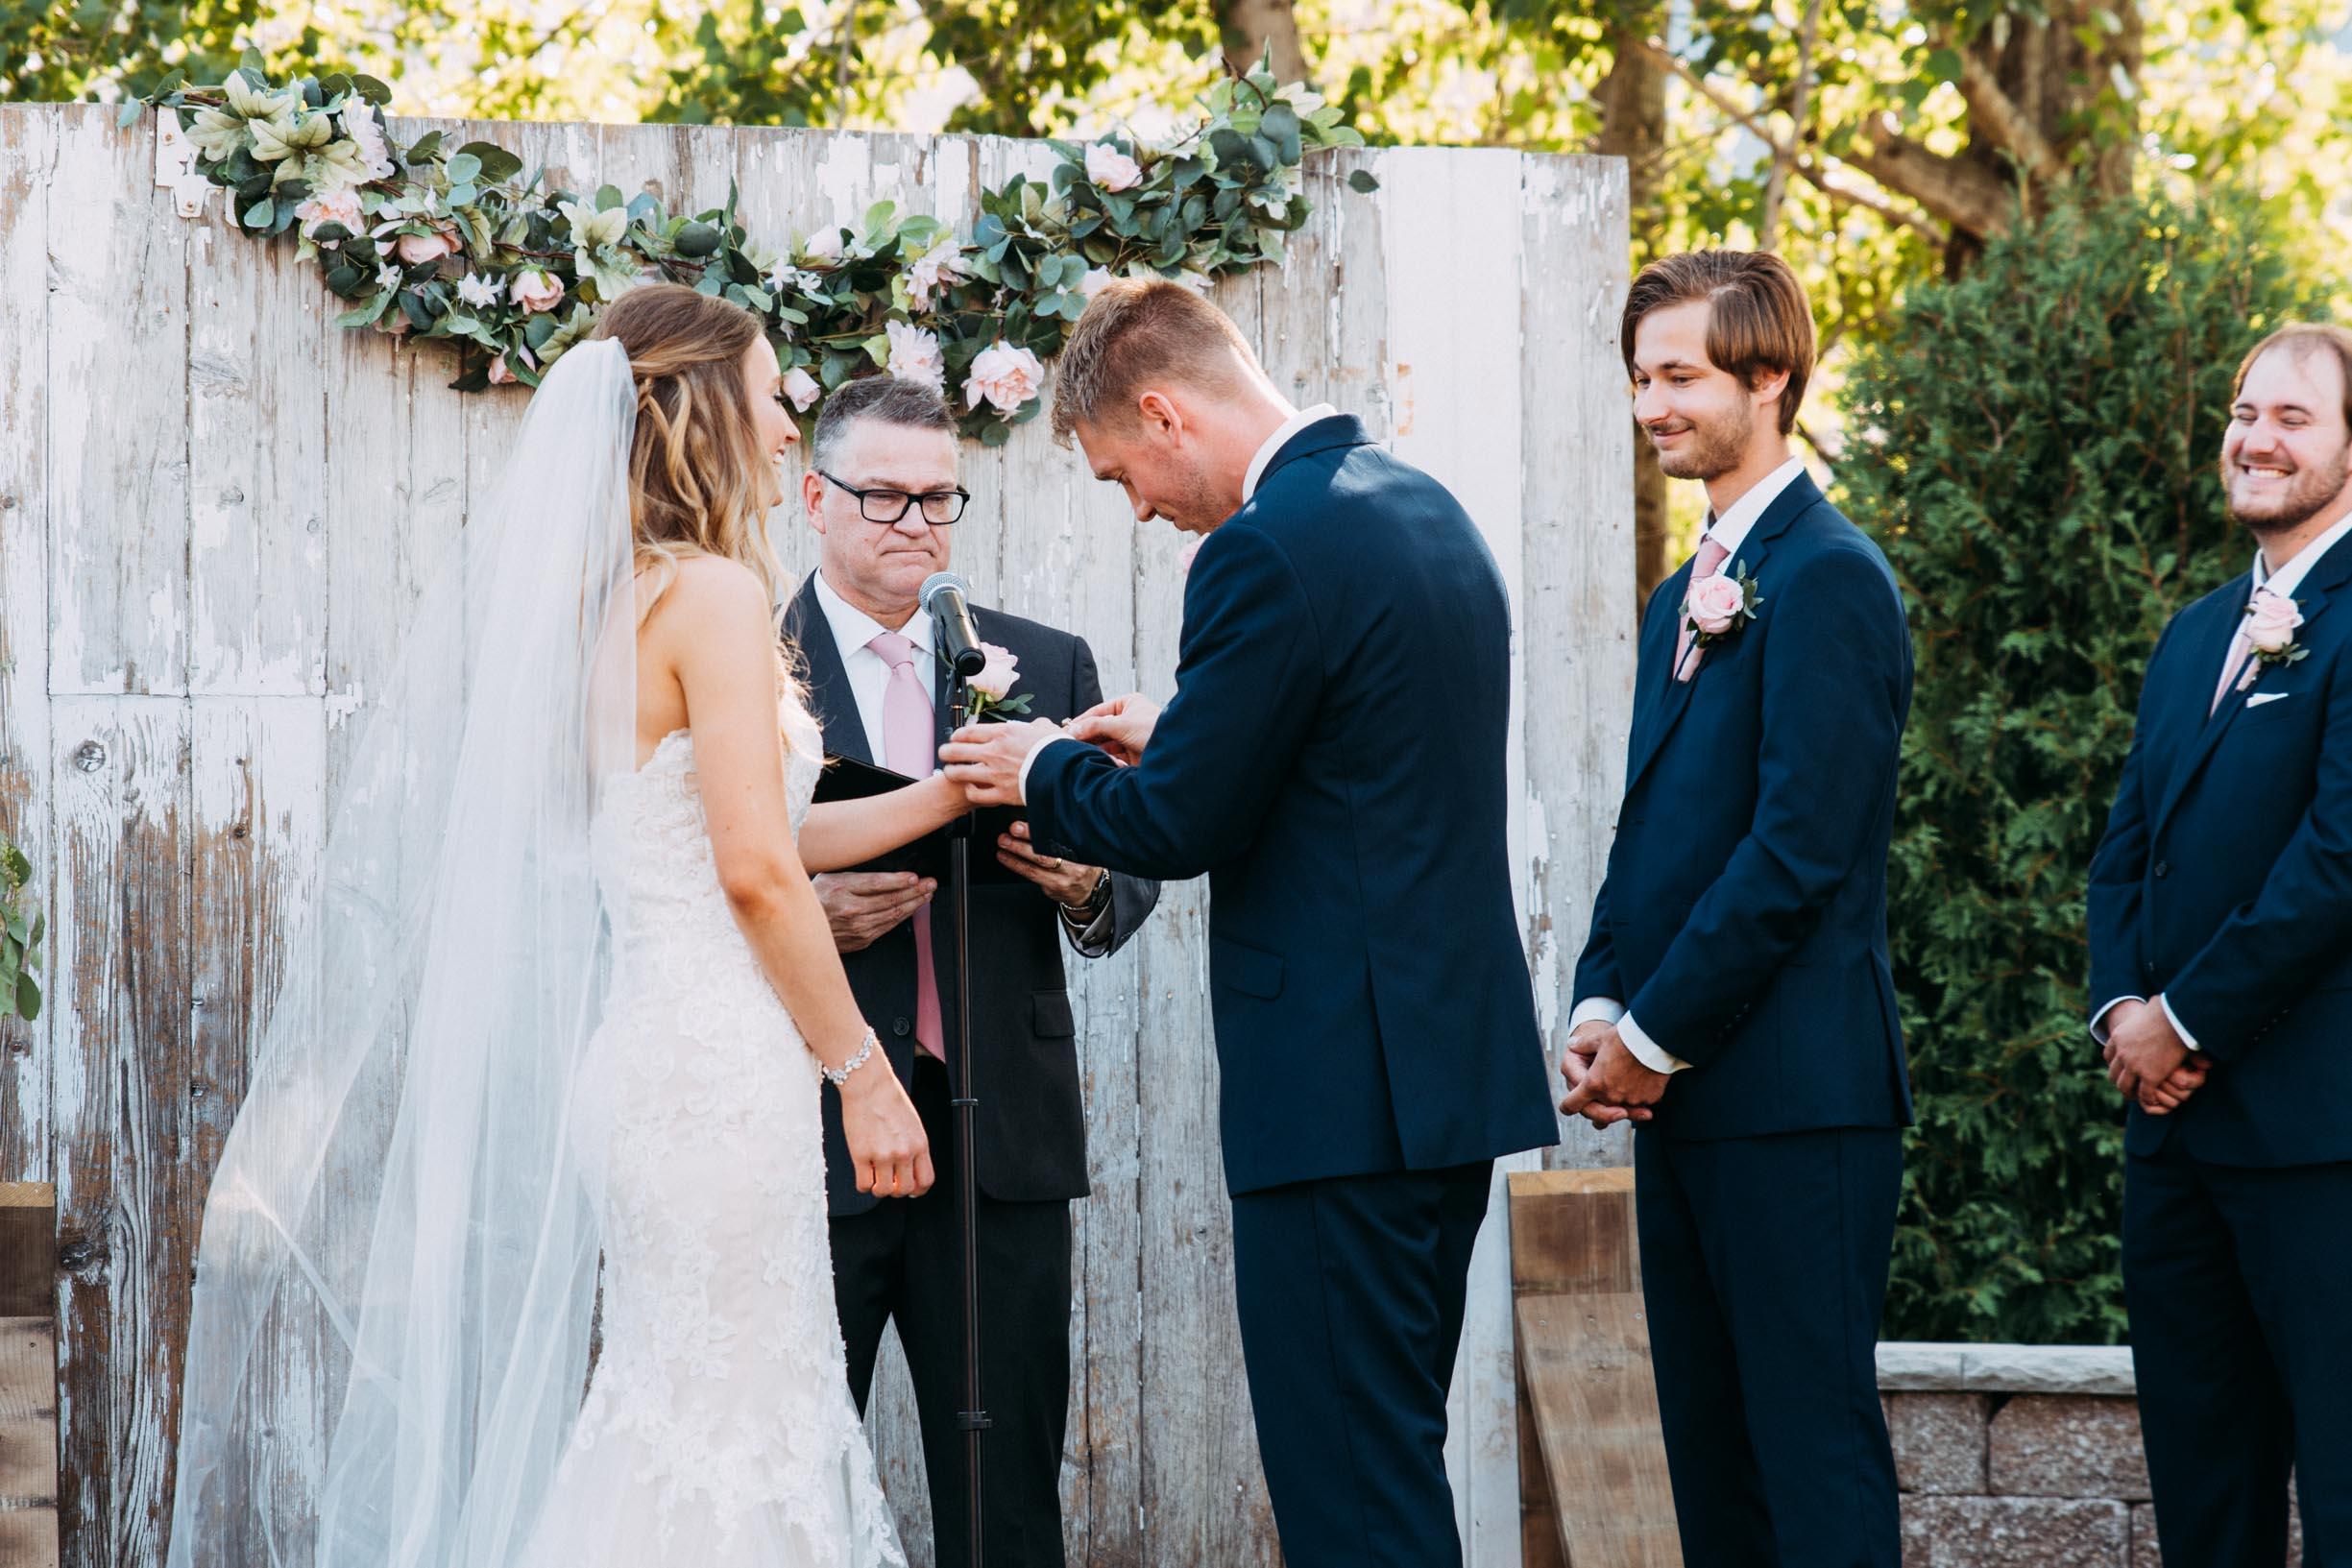 58-WeddingsattheBroz_Minnesota_WeddingBlog_Ceremony.jpg